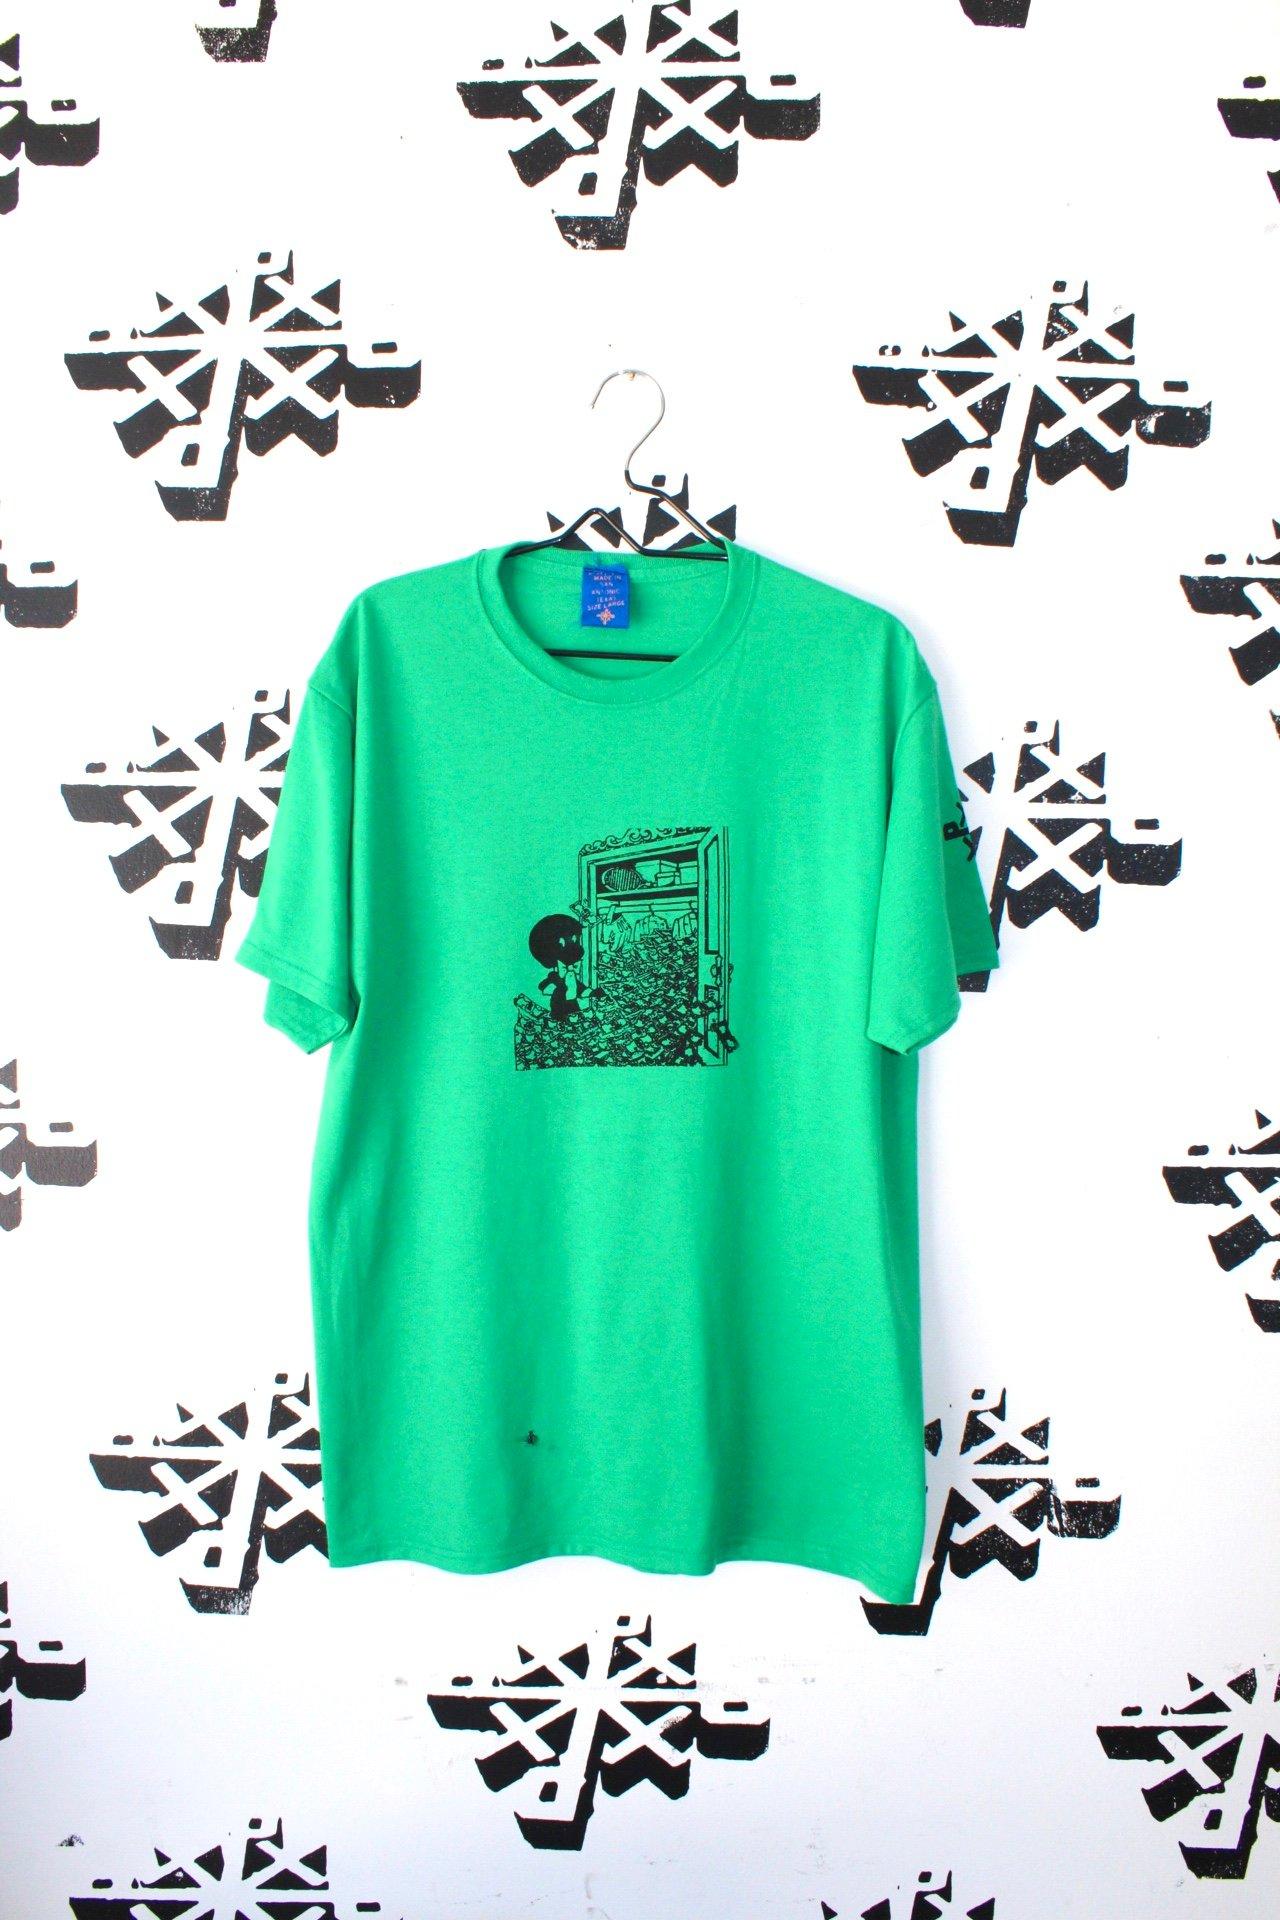 Image of stash it tee in green